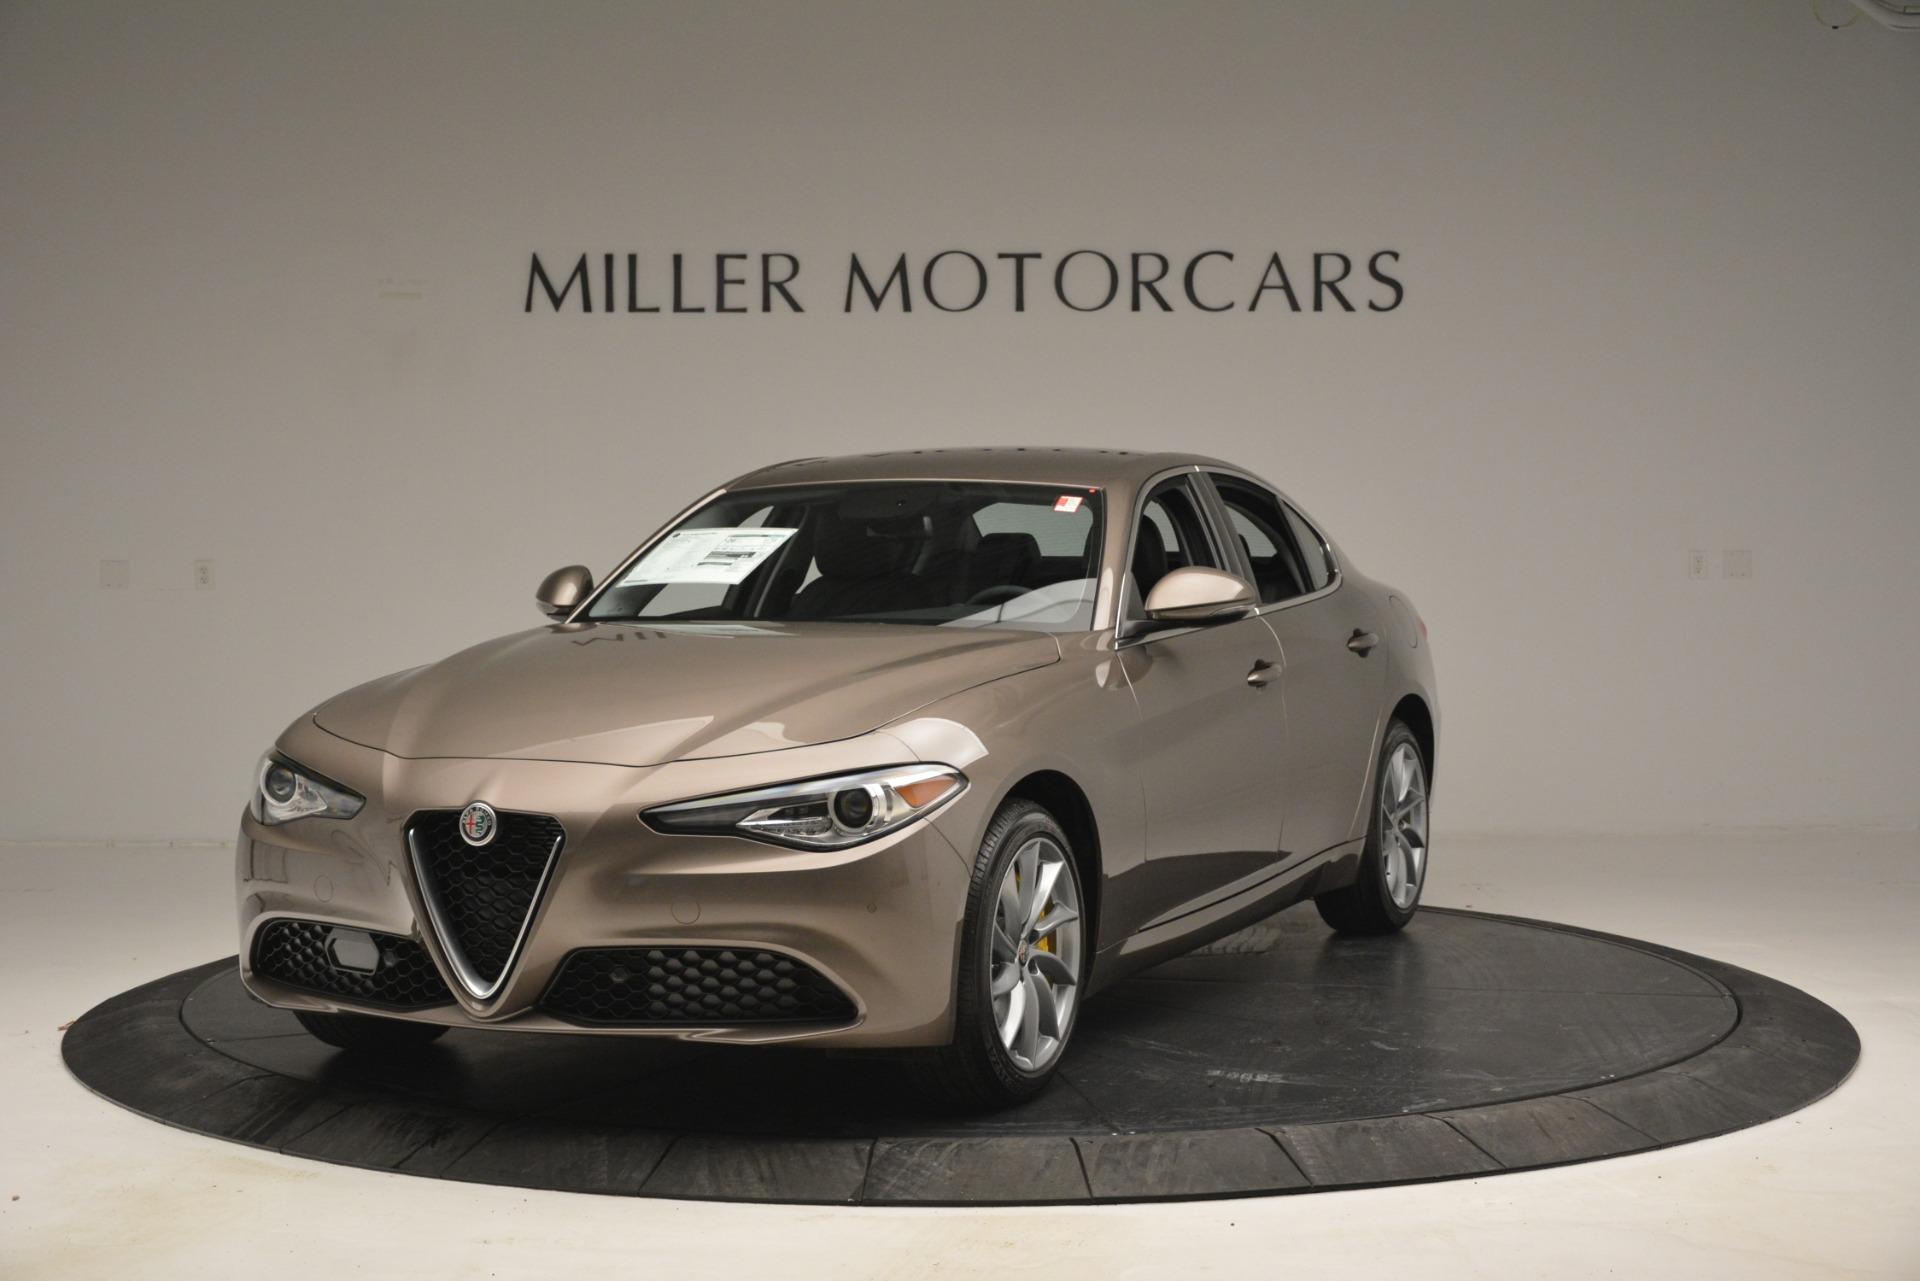 New 2019 Alfa Romeo Giulia Q4 for sale Sold at Pagani of Greenwich in Greenwich CT 06830 1